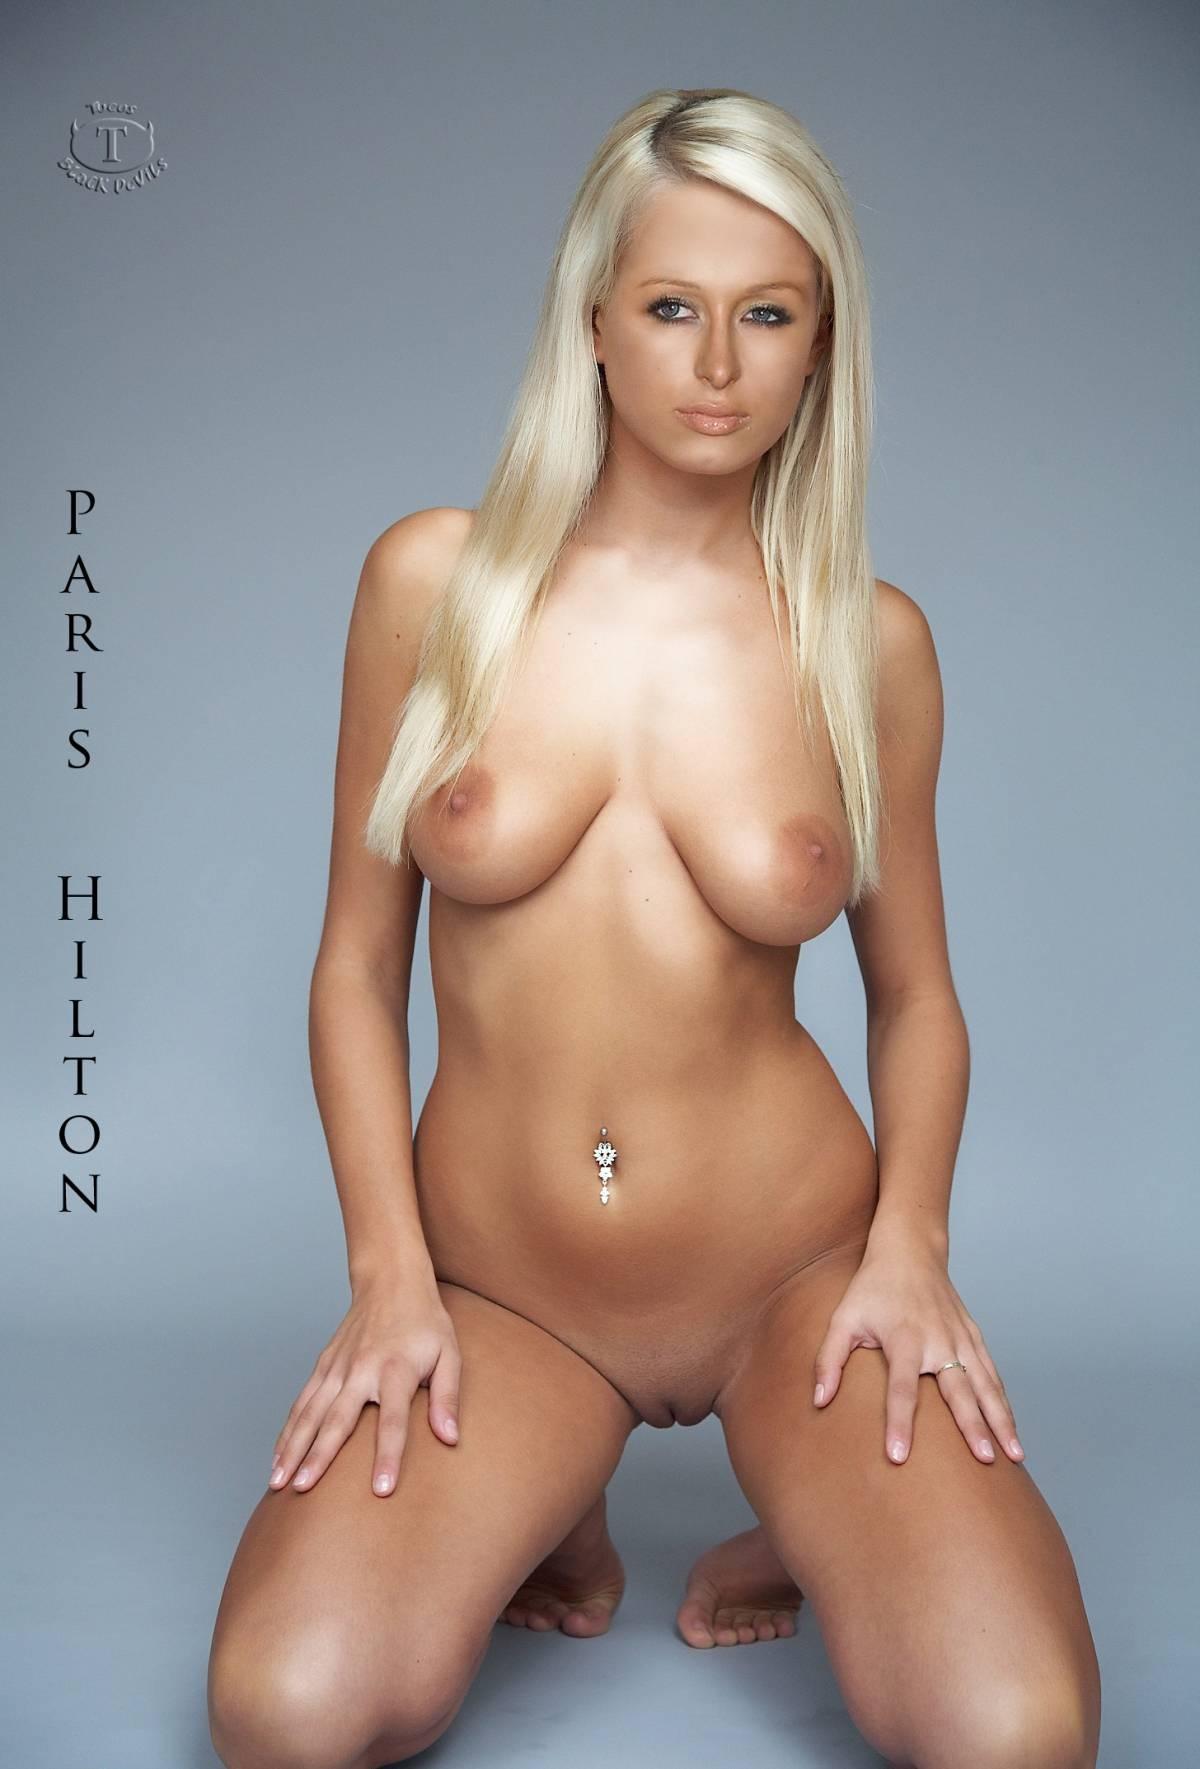 Women of pics nude ufc